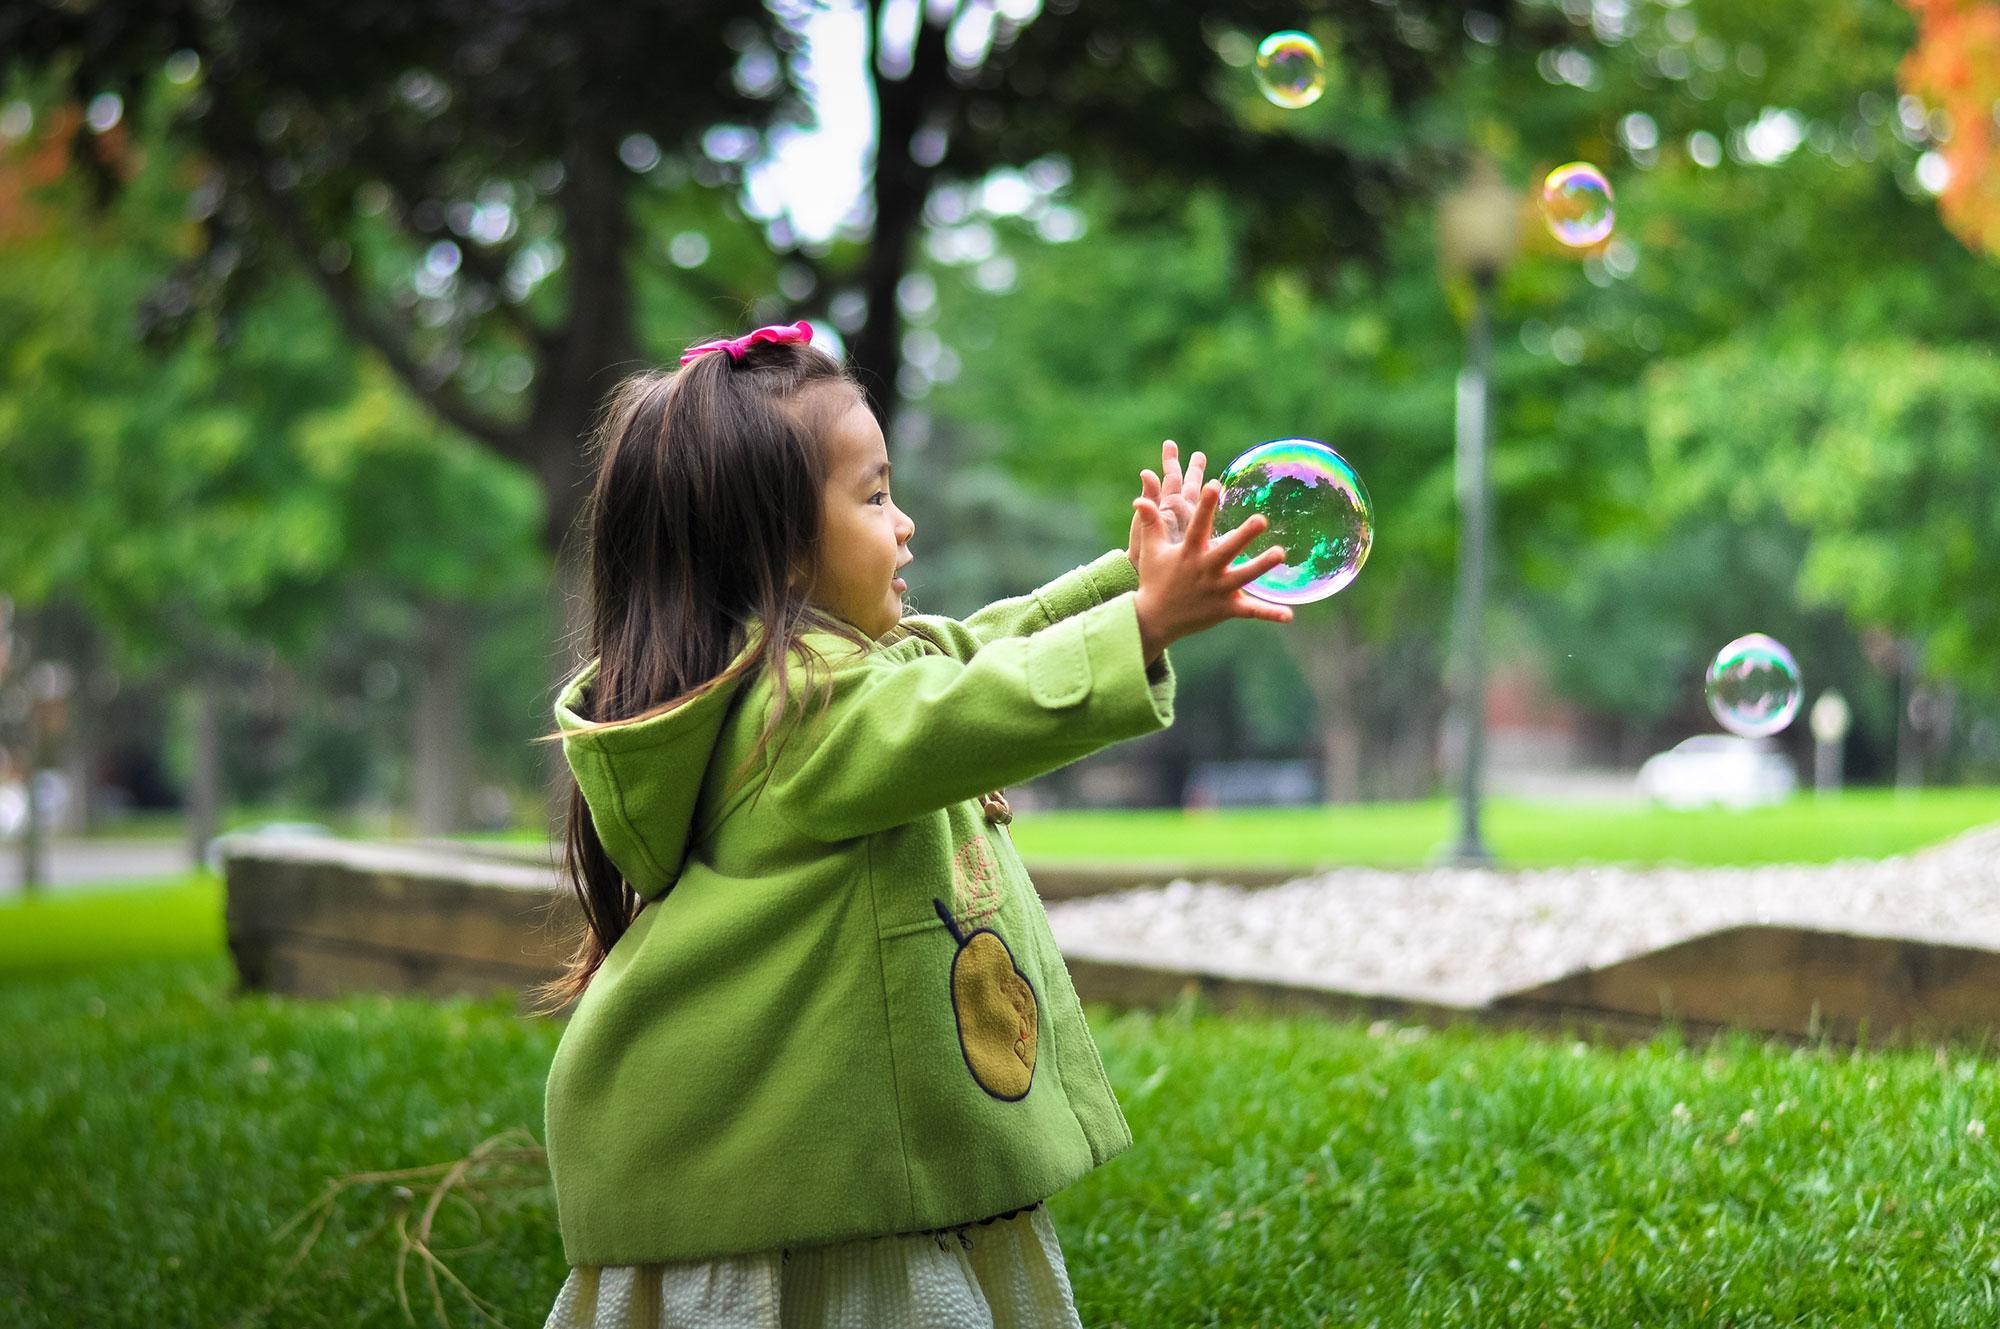 Volunteer - Children's Home Society of Florida